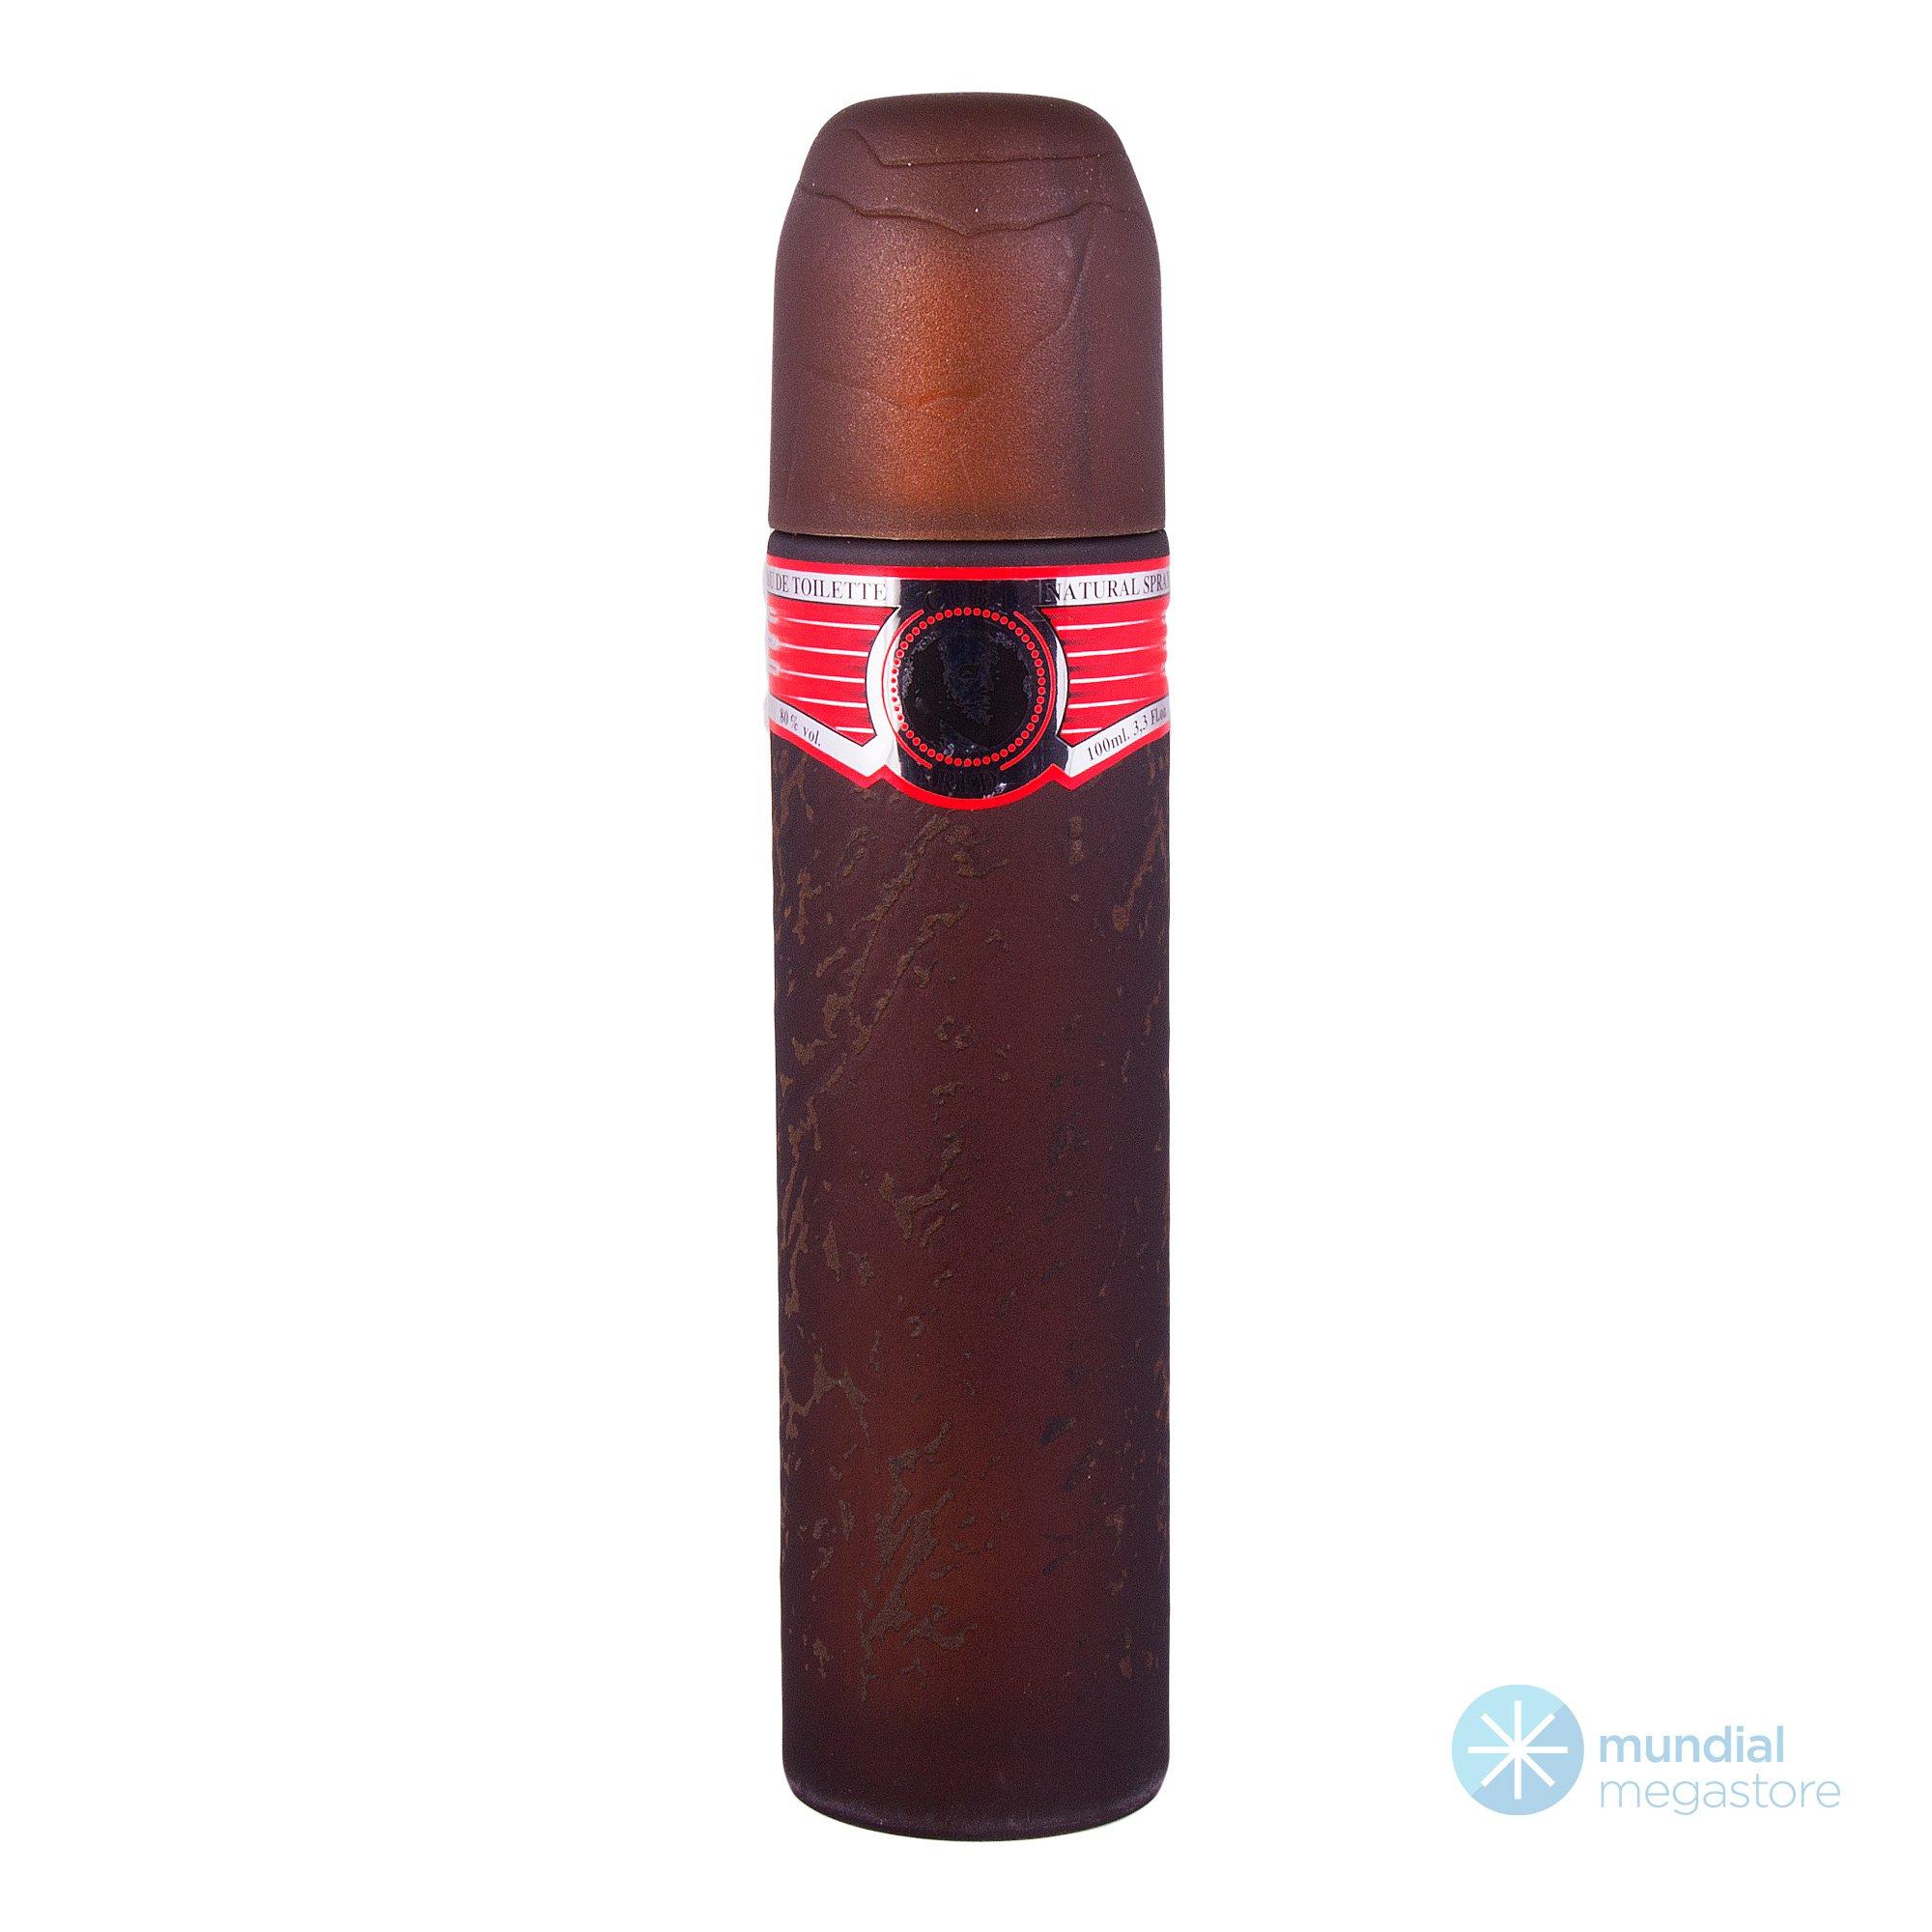 perfume cuba red masculino 100 ml burberry london 35050 2000 195755